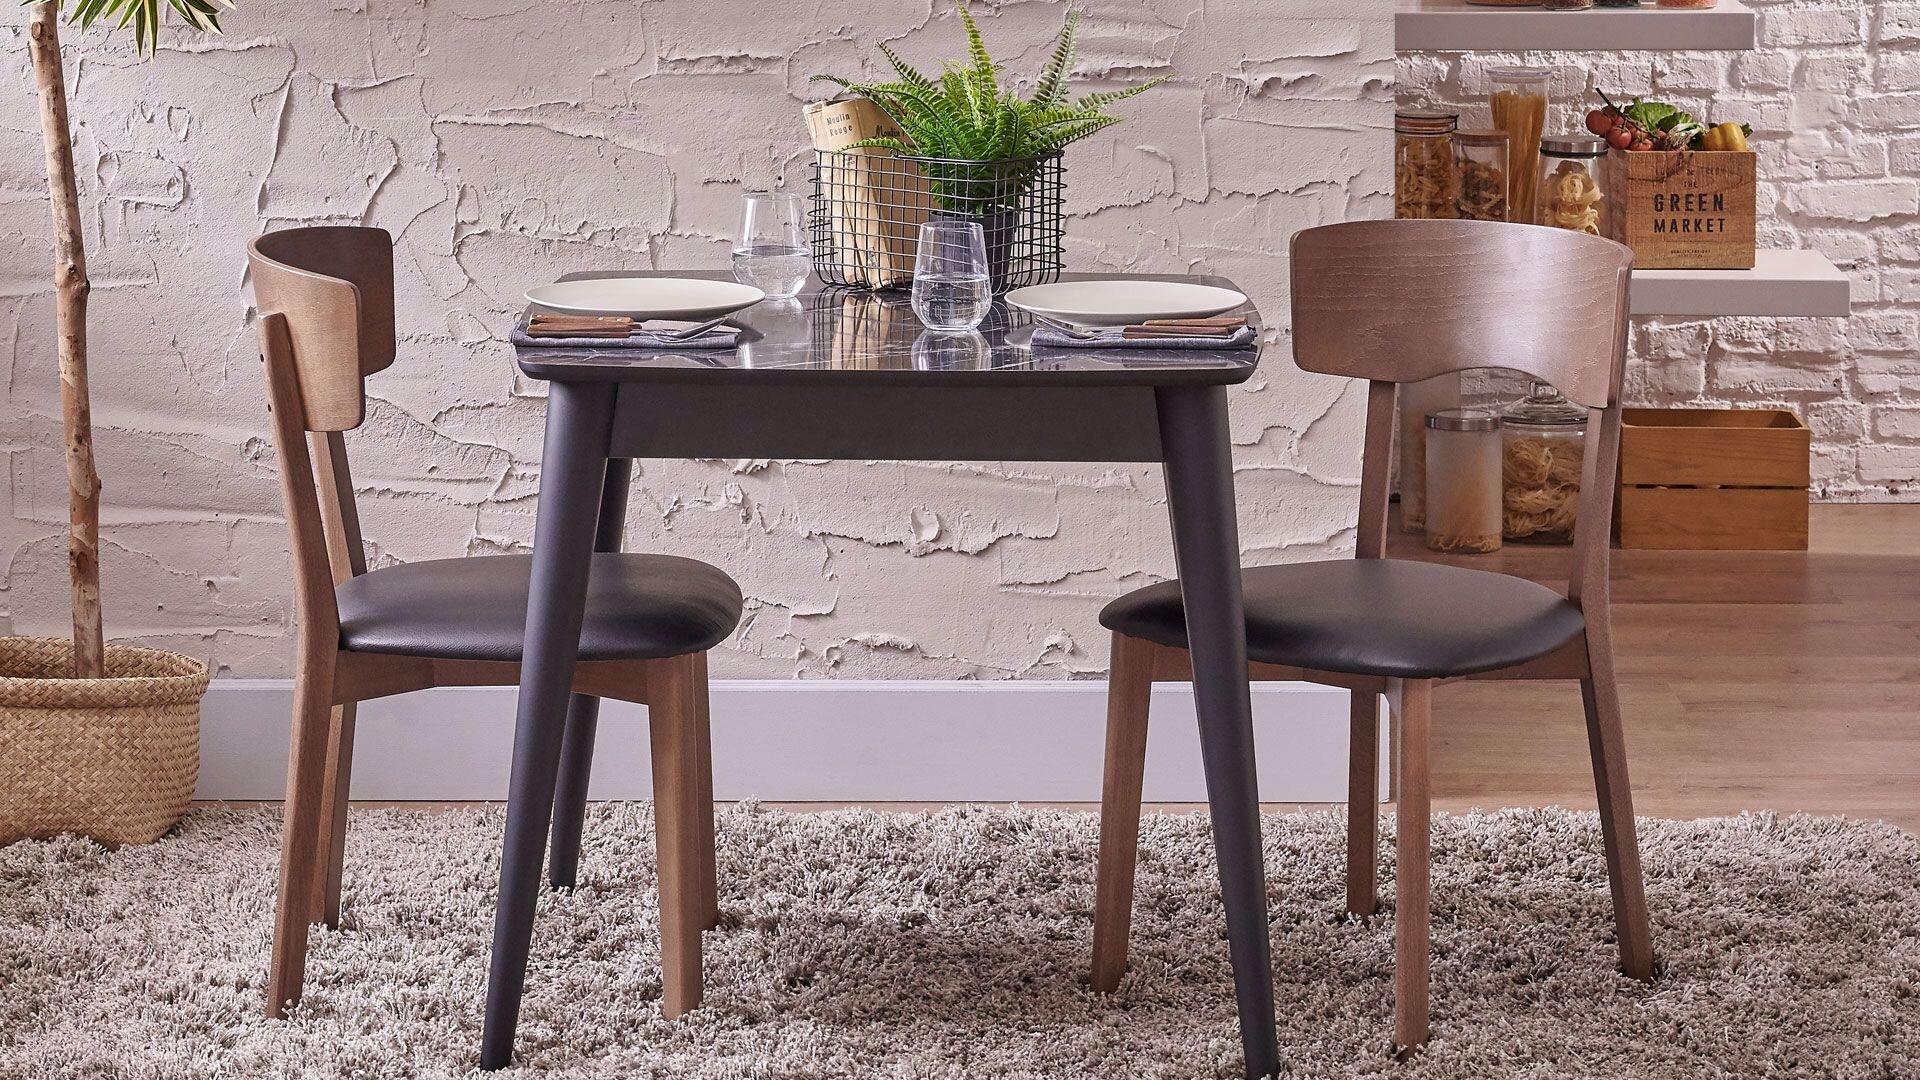 Pedra Fixed Dining Table Black Leg 80*80 Cm